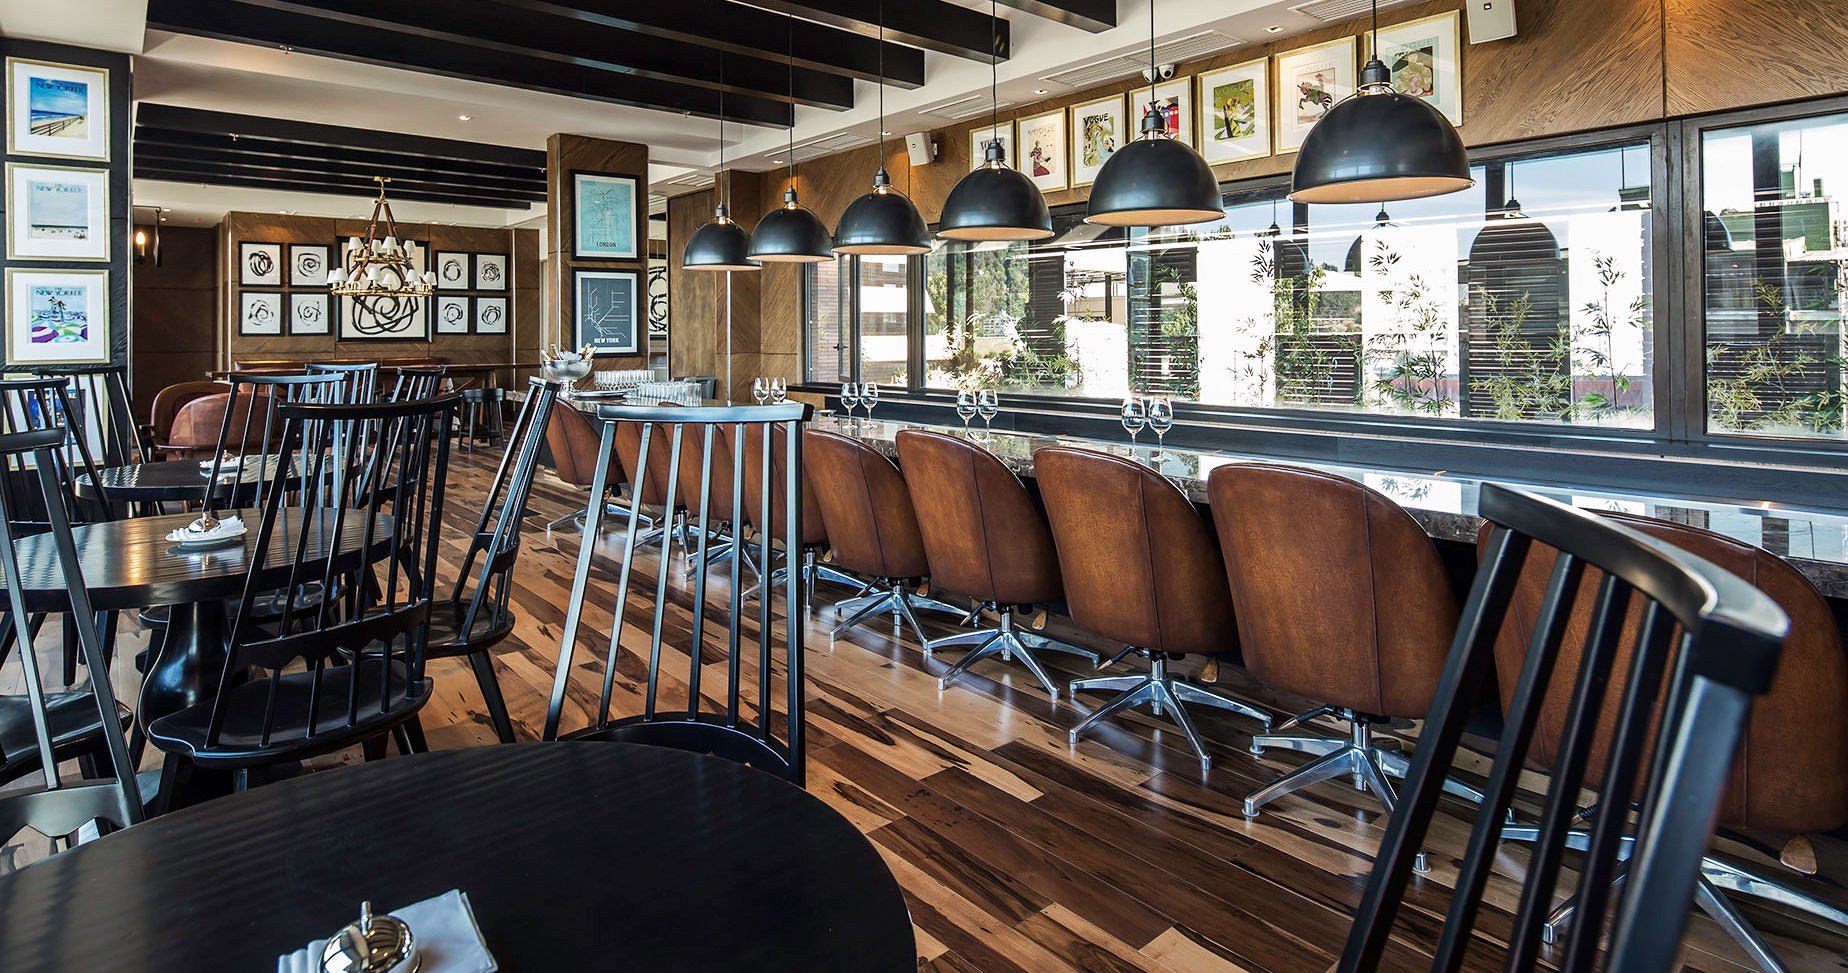 hotel bar stools